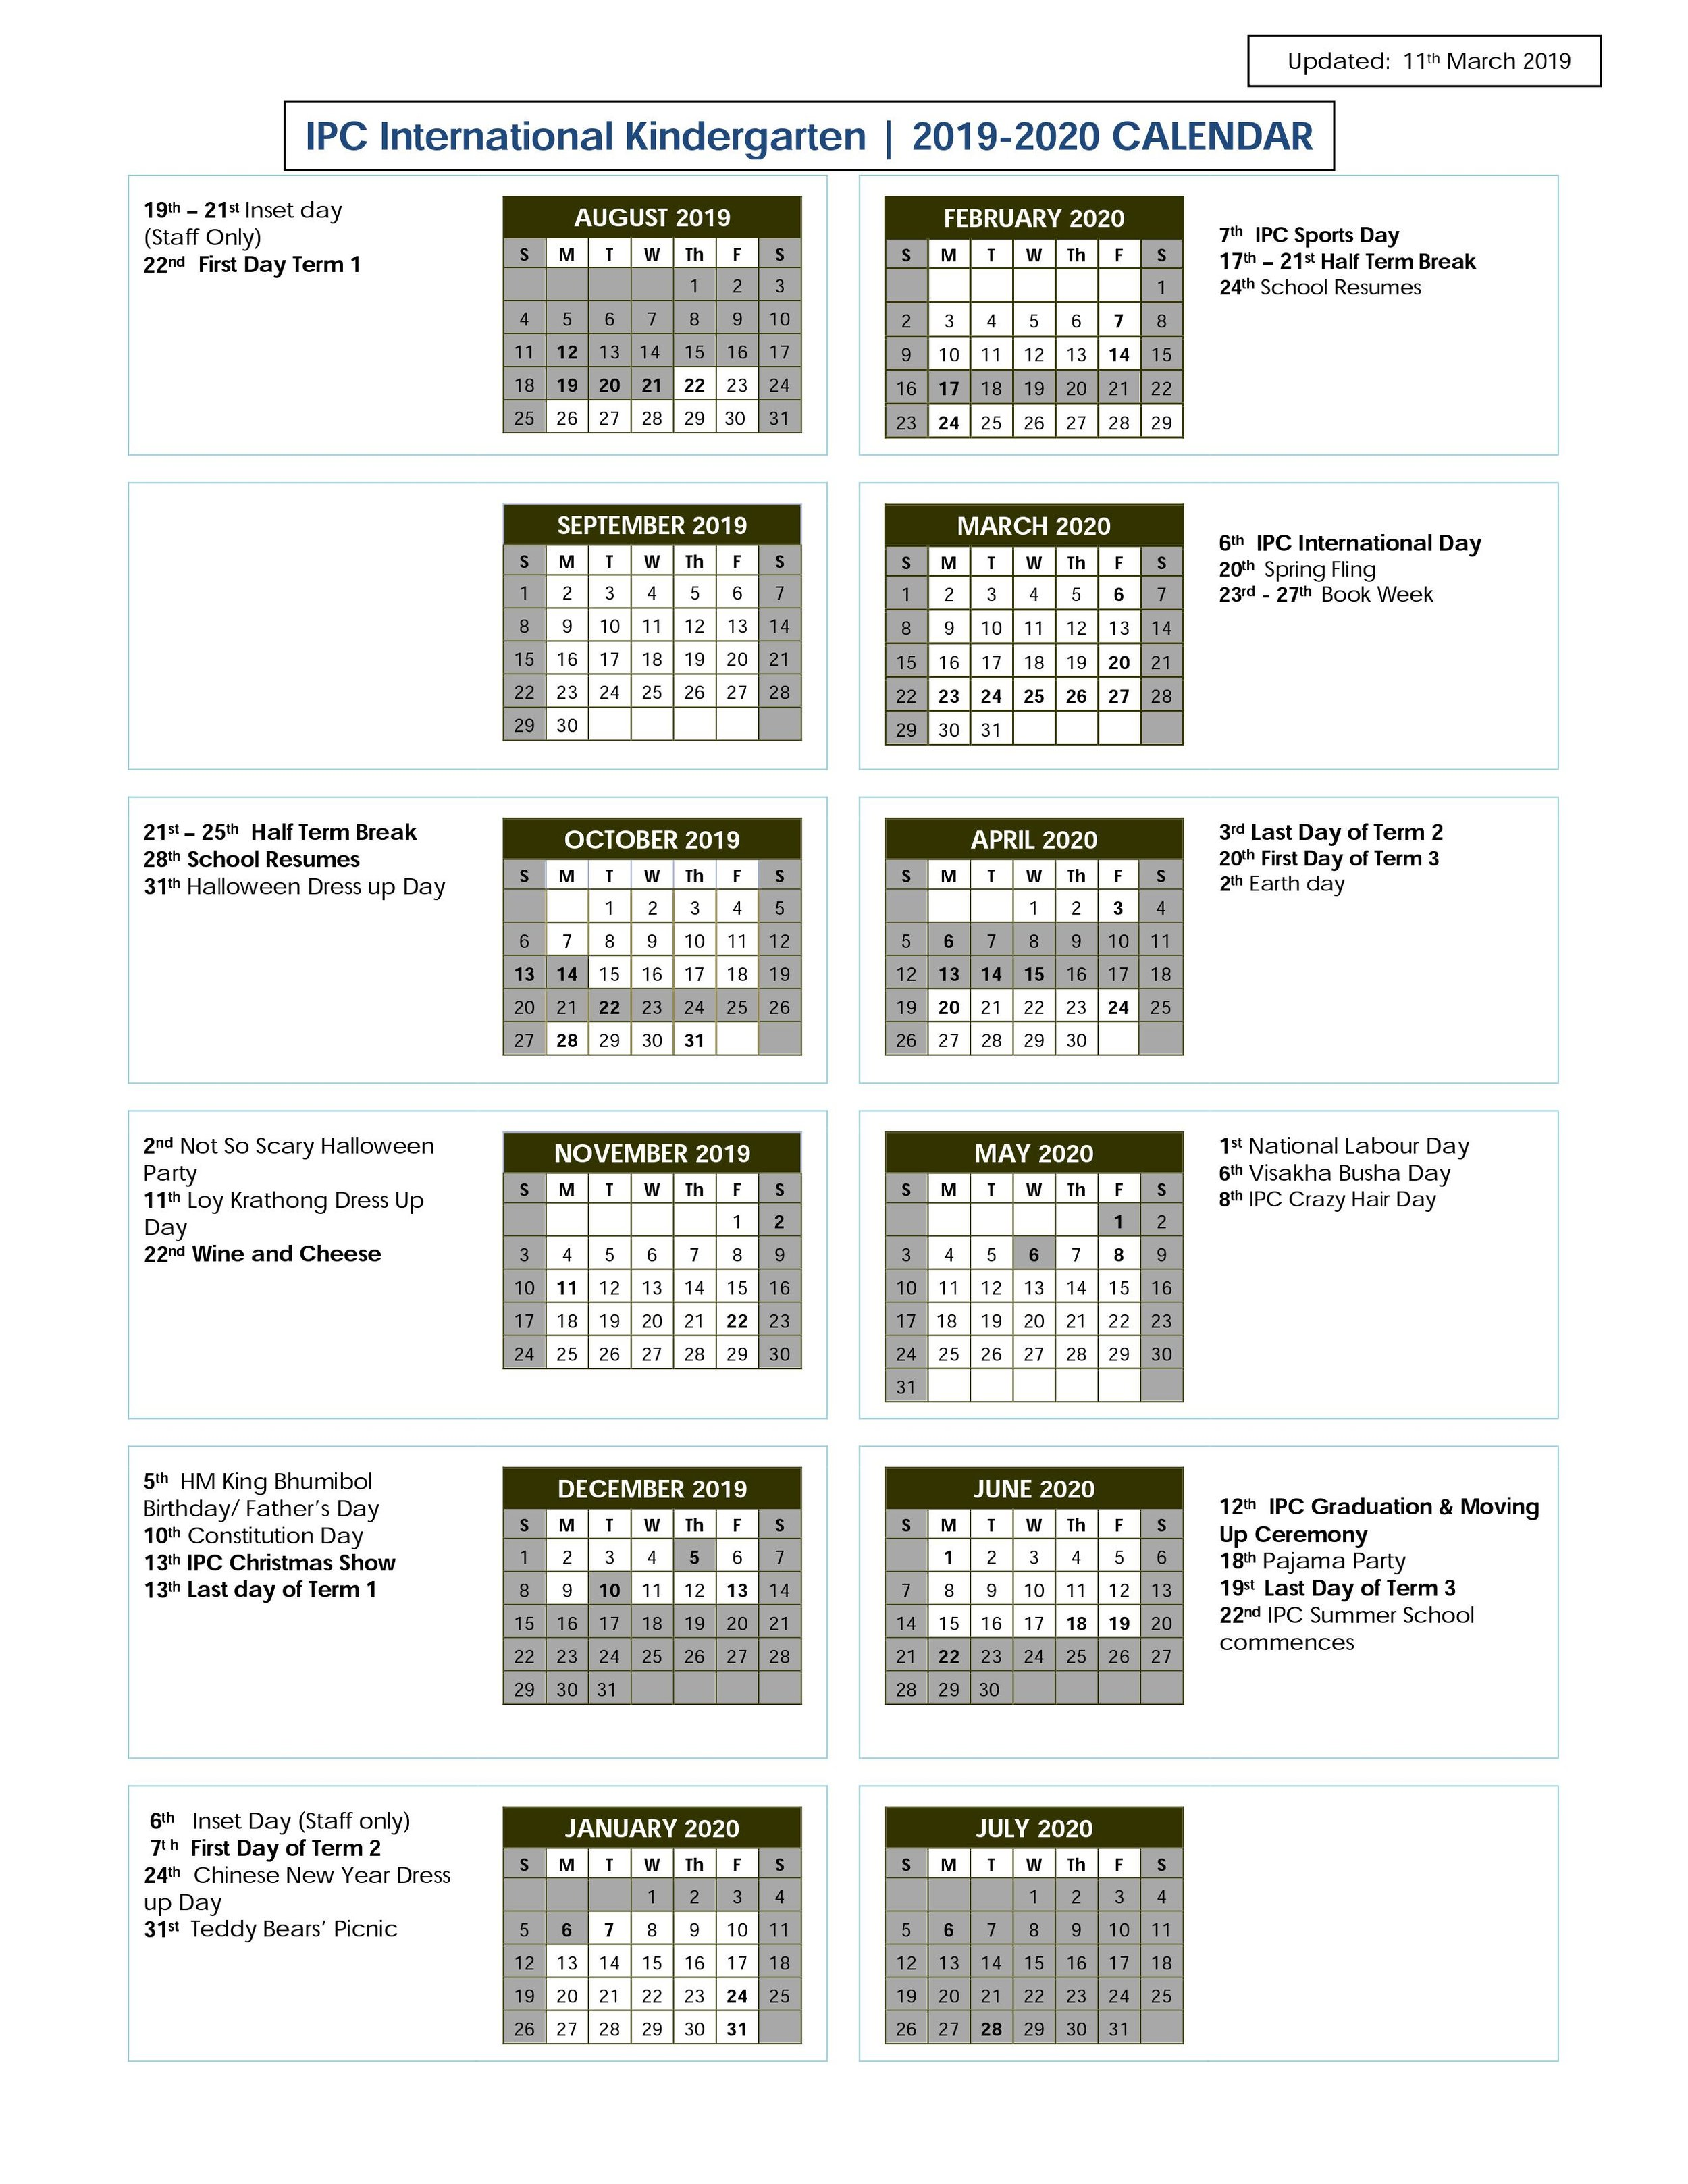 IPC Green 2019-2020 Calendar.jpg